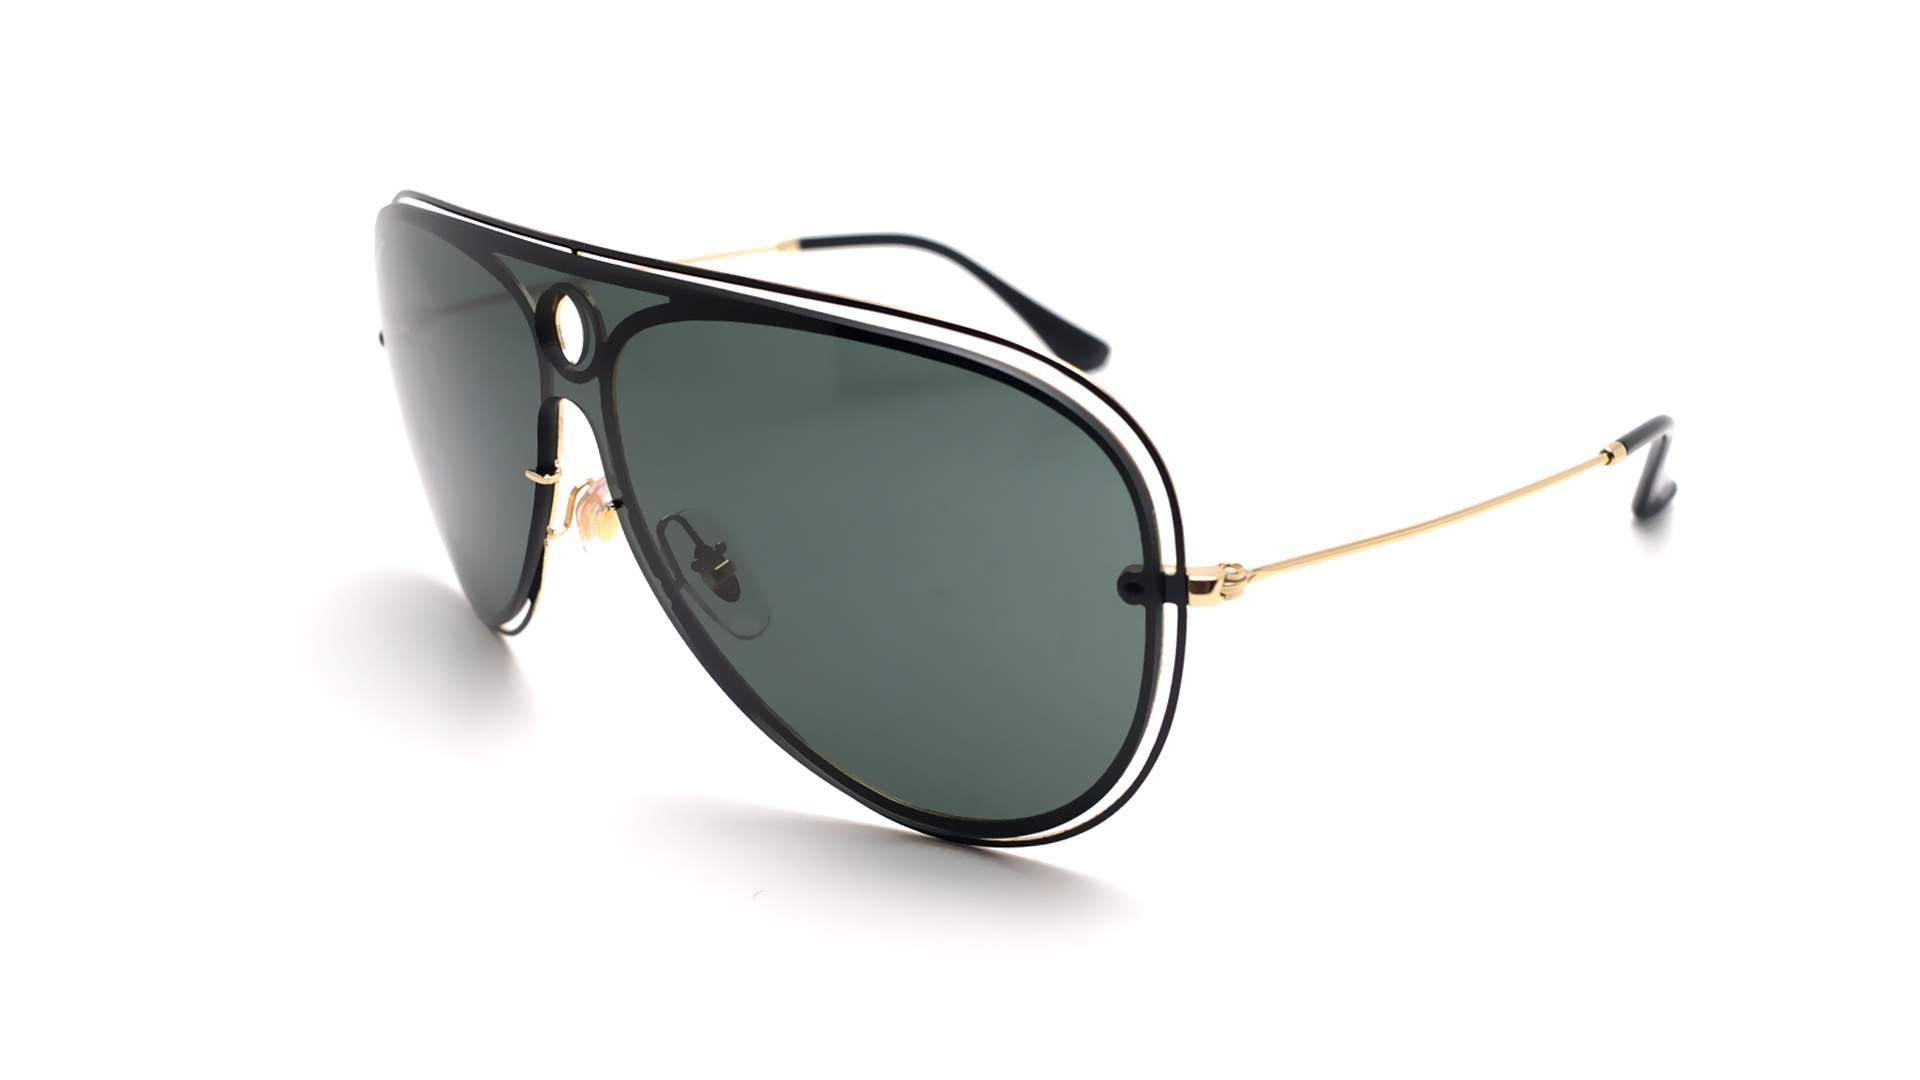 a01c26db34 Sunglasses Ray-Ban Shooter Blaze Black RB3605N 187 71 32-20 Medium